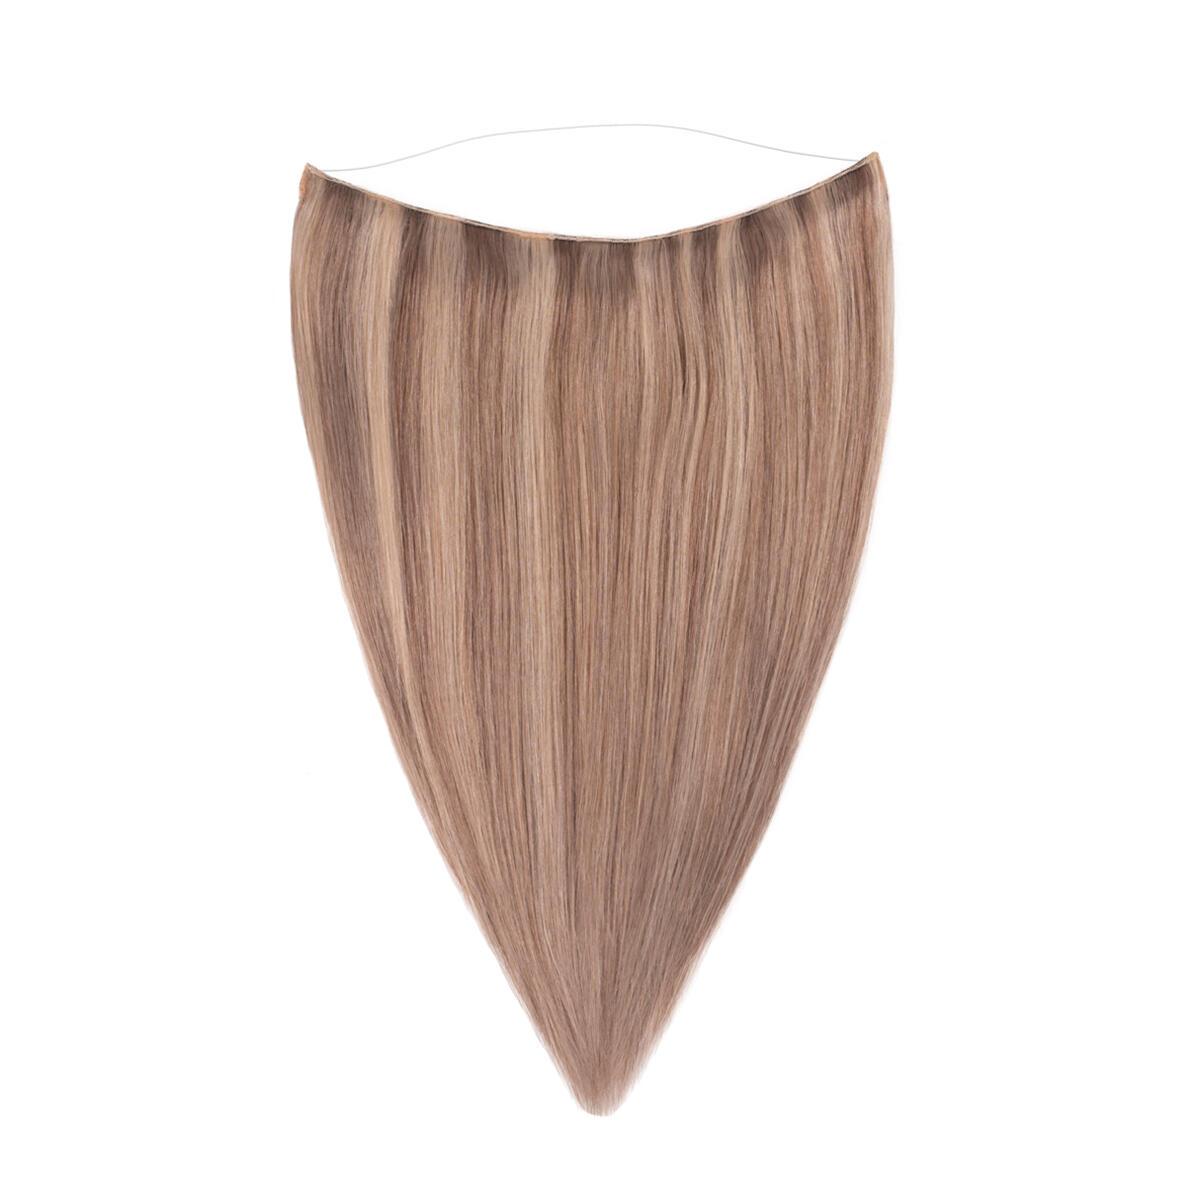 Hairband Original M7.1/10.8 Natural Ash Blonde Mix 45 cm